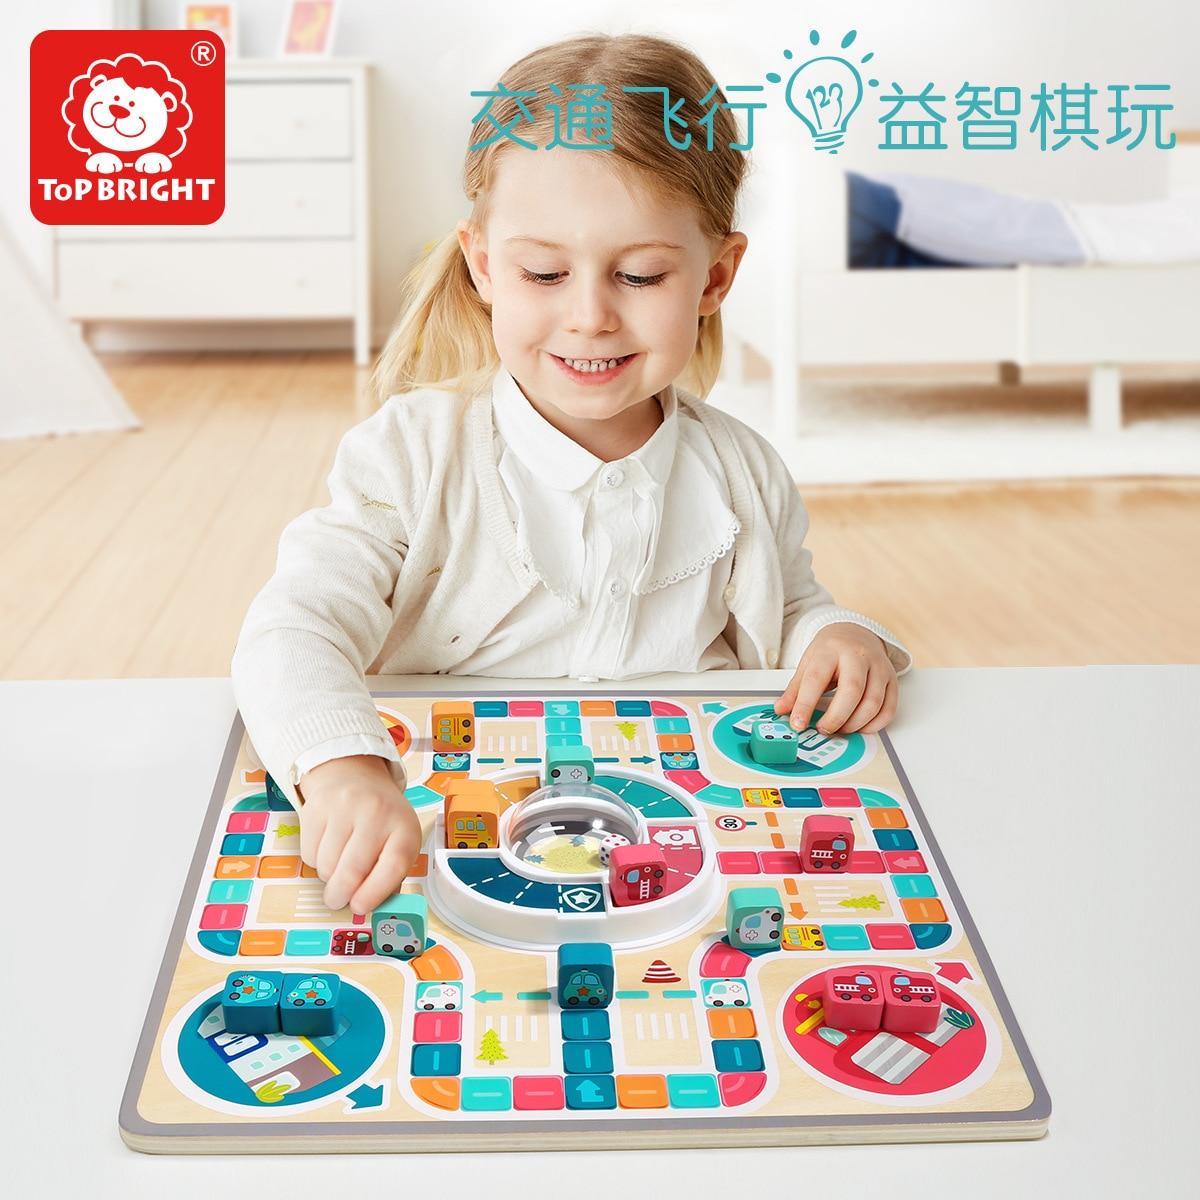 TOPBRIGHT מטוס שחמט רב תפקודי משחק שחמט שחמט ילדי לוח משחק ההורה ילד אינטראקטיבי צעצוע Educatio